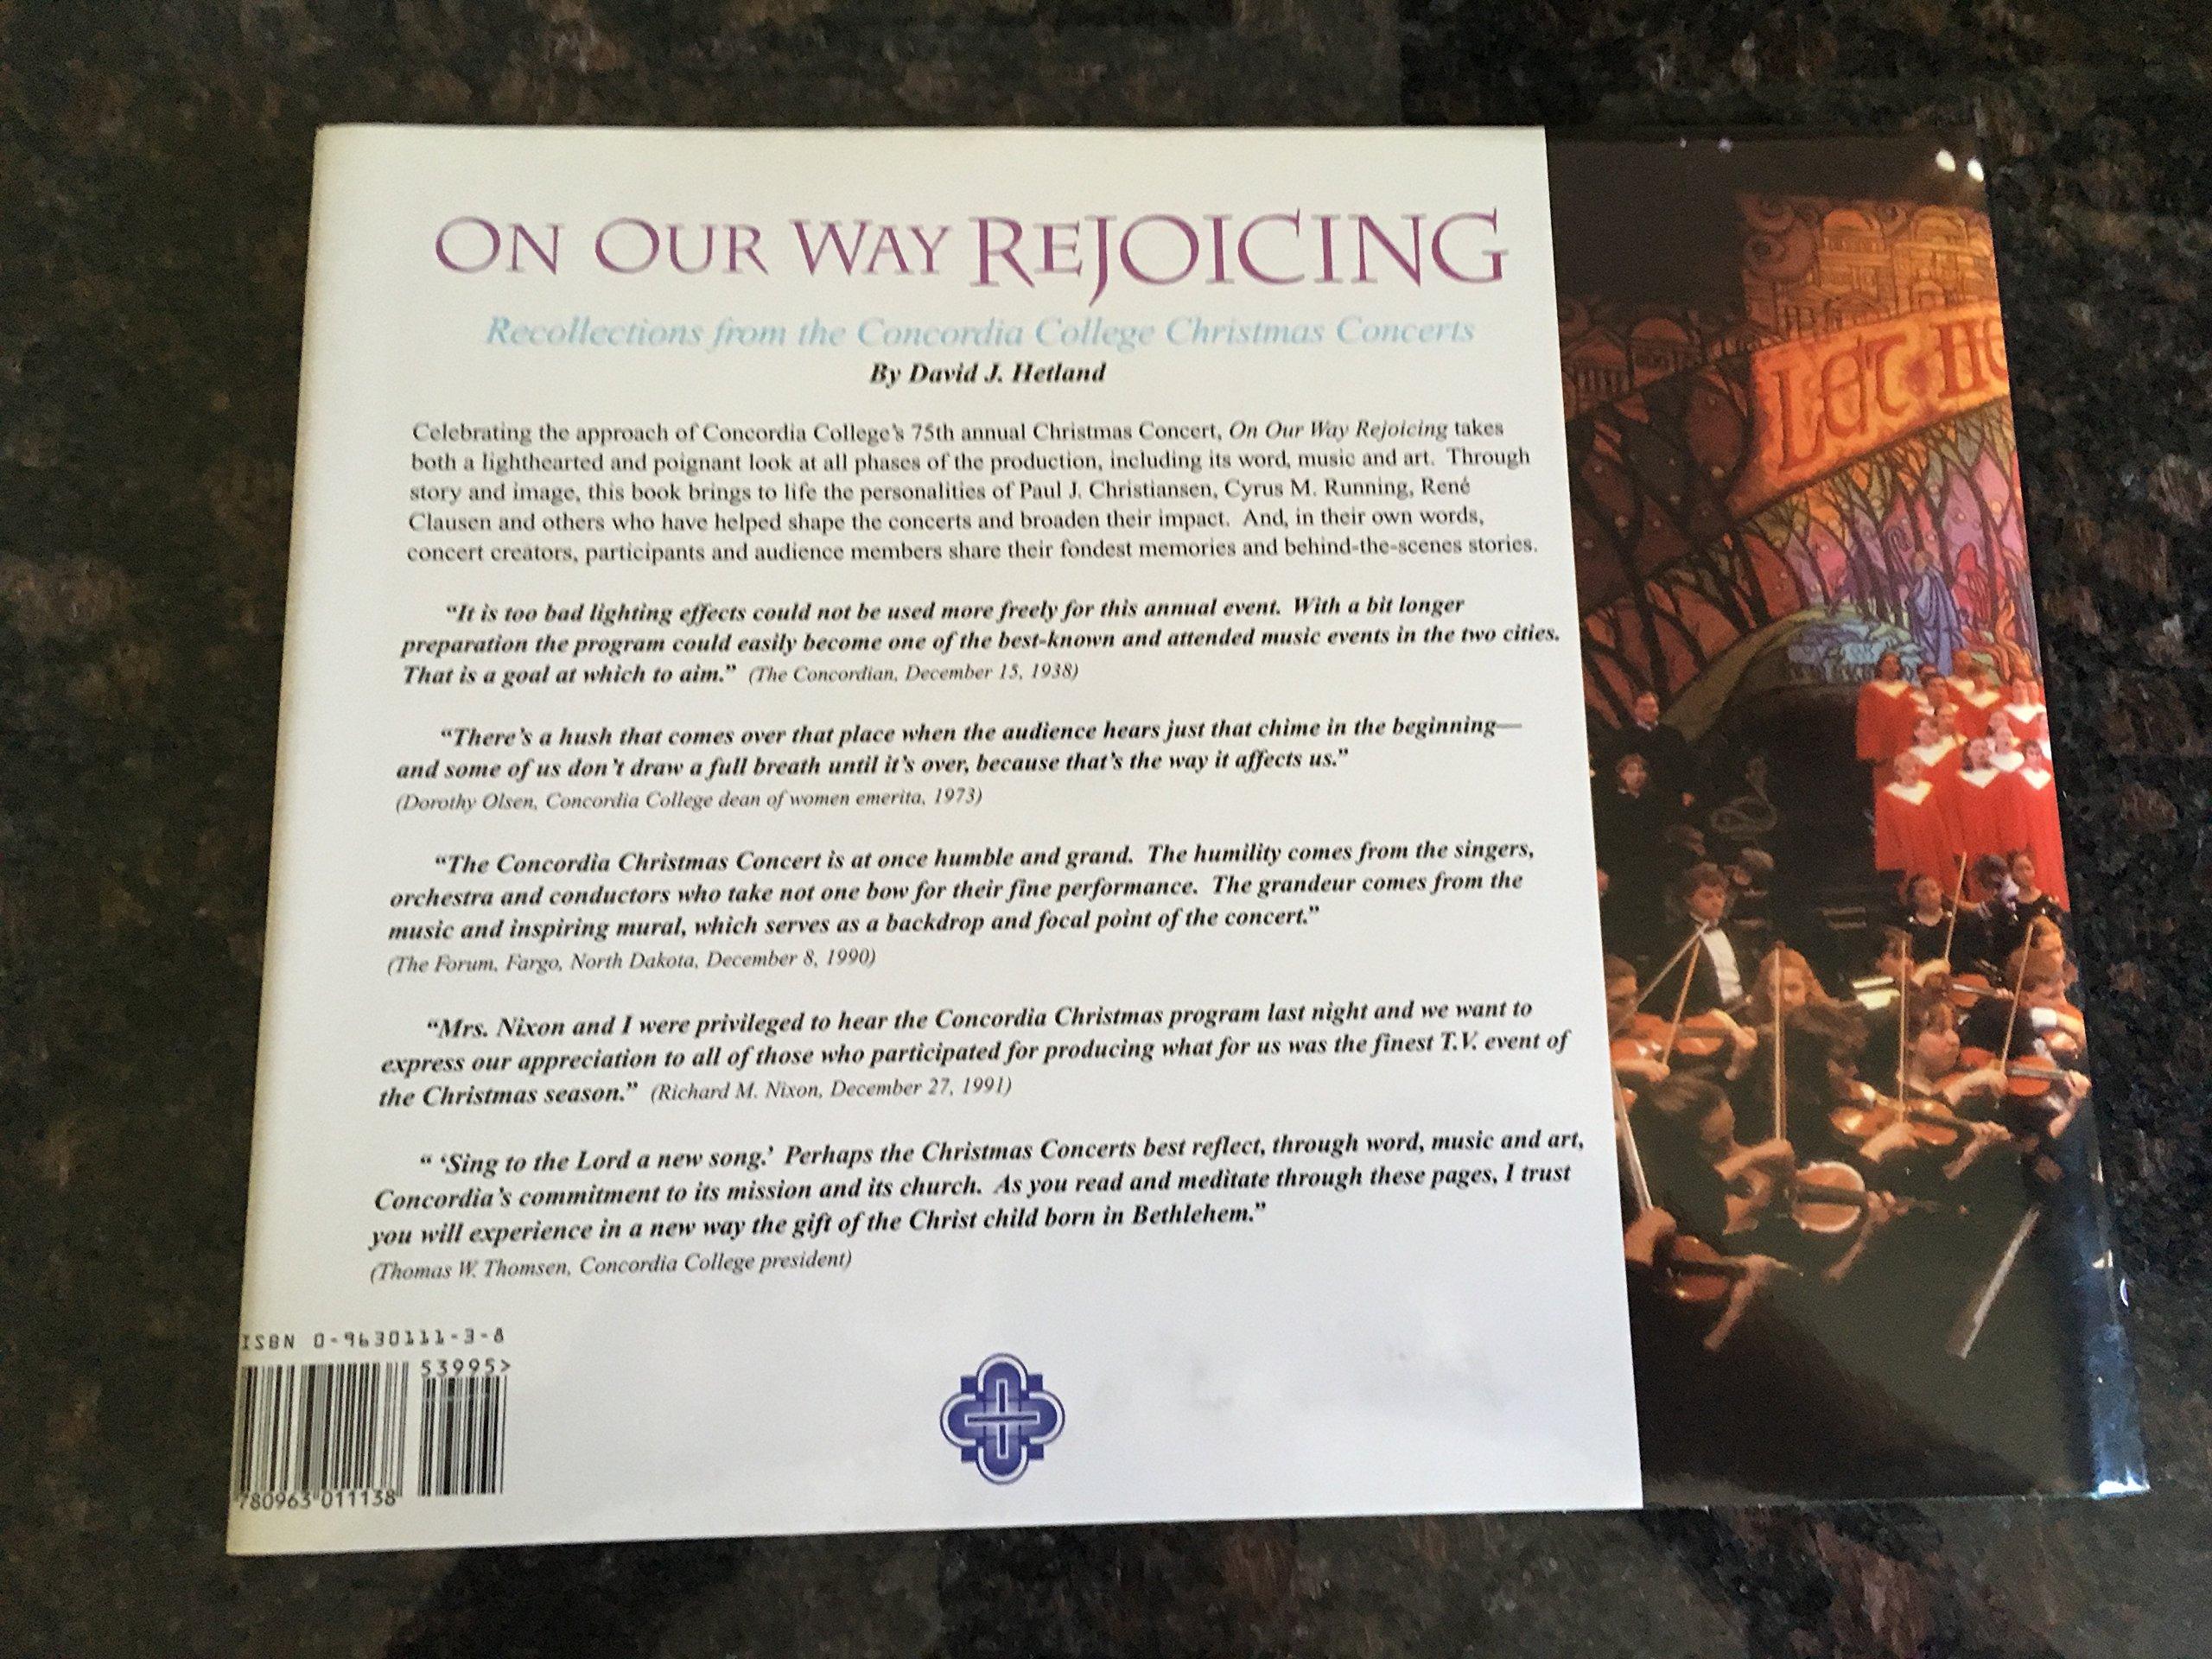 On Your Way Rejoicing: David Hetland: 9780963011138: Amazon.com: Books